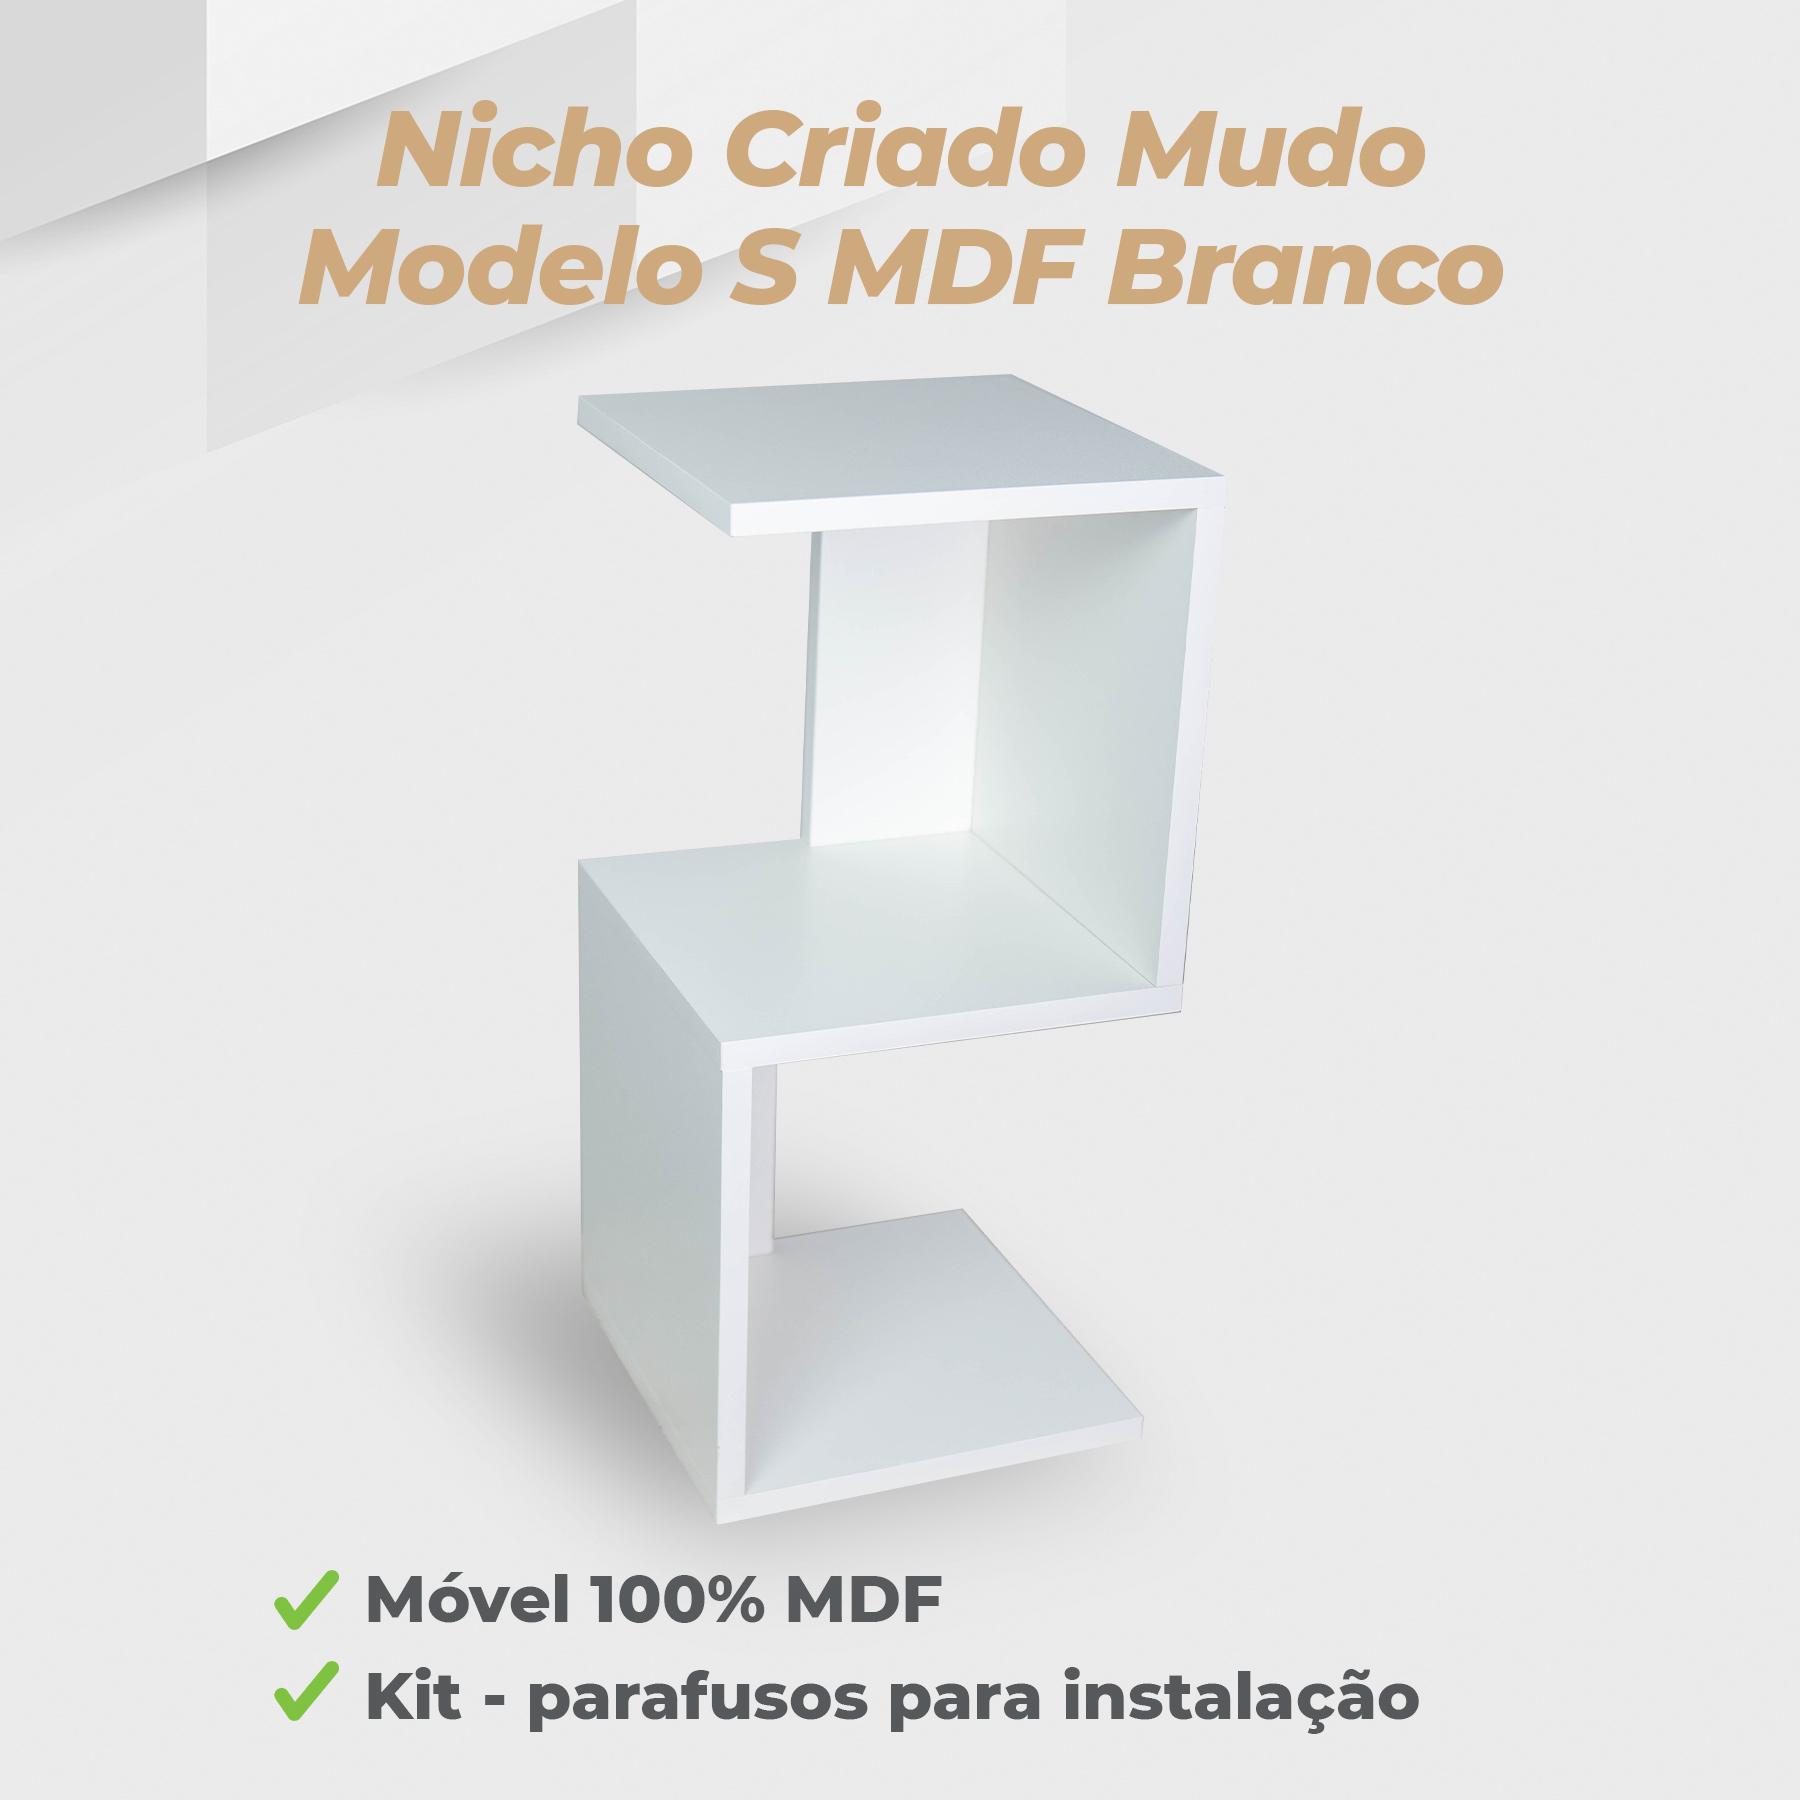 Kit Nicho Criado Mudo Modelo S MDF Branco - 2 Unidades